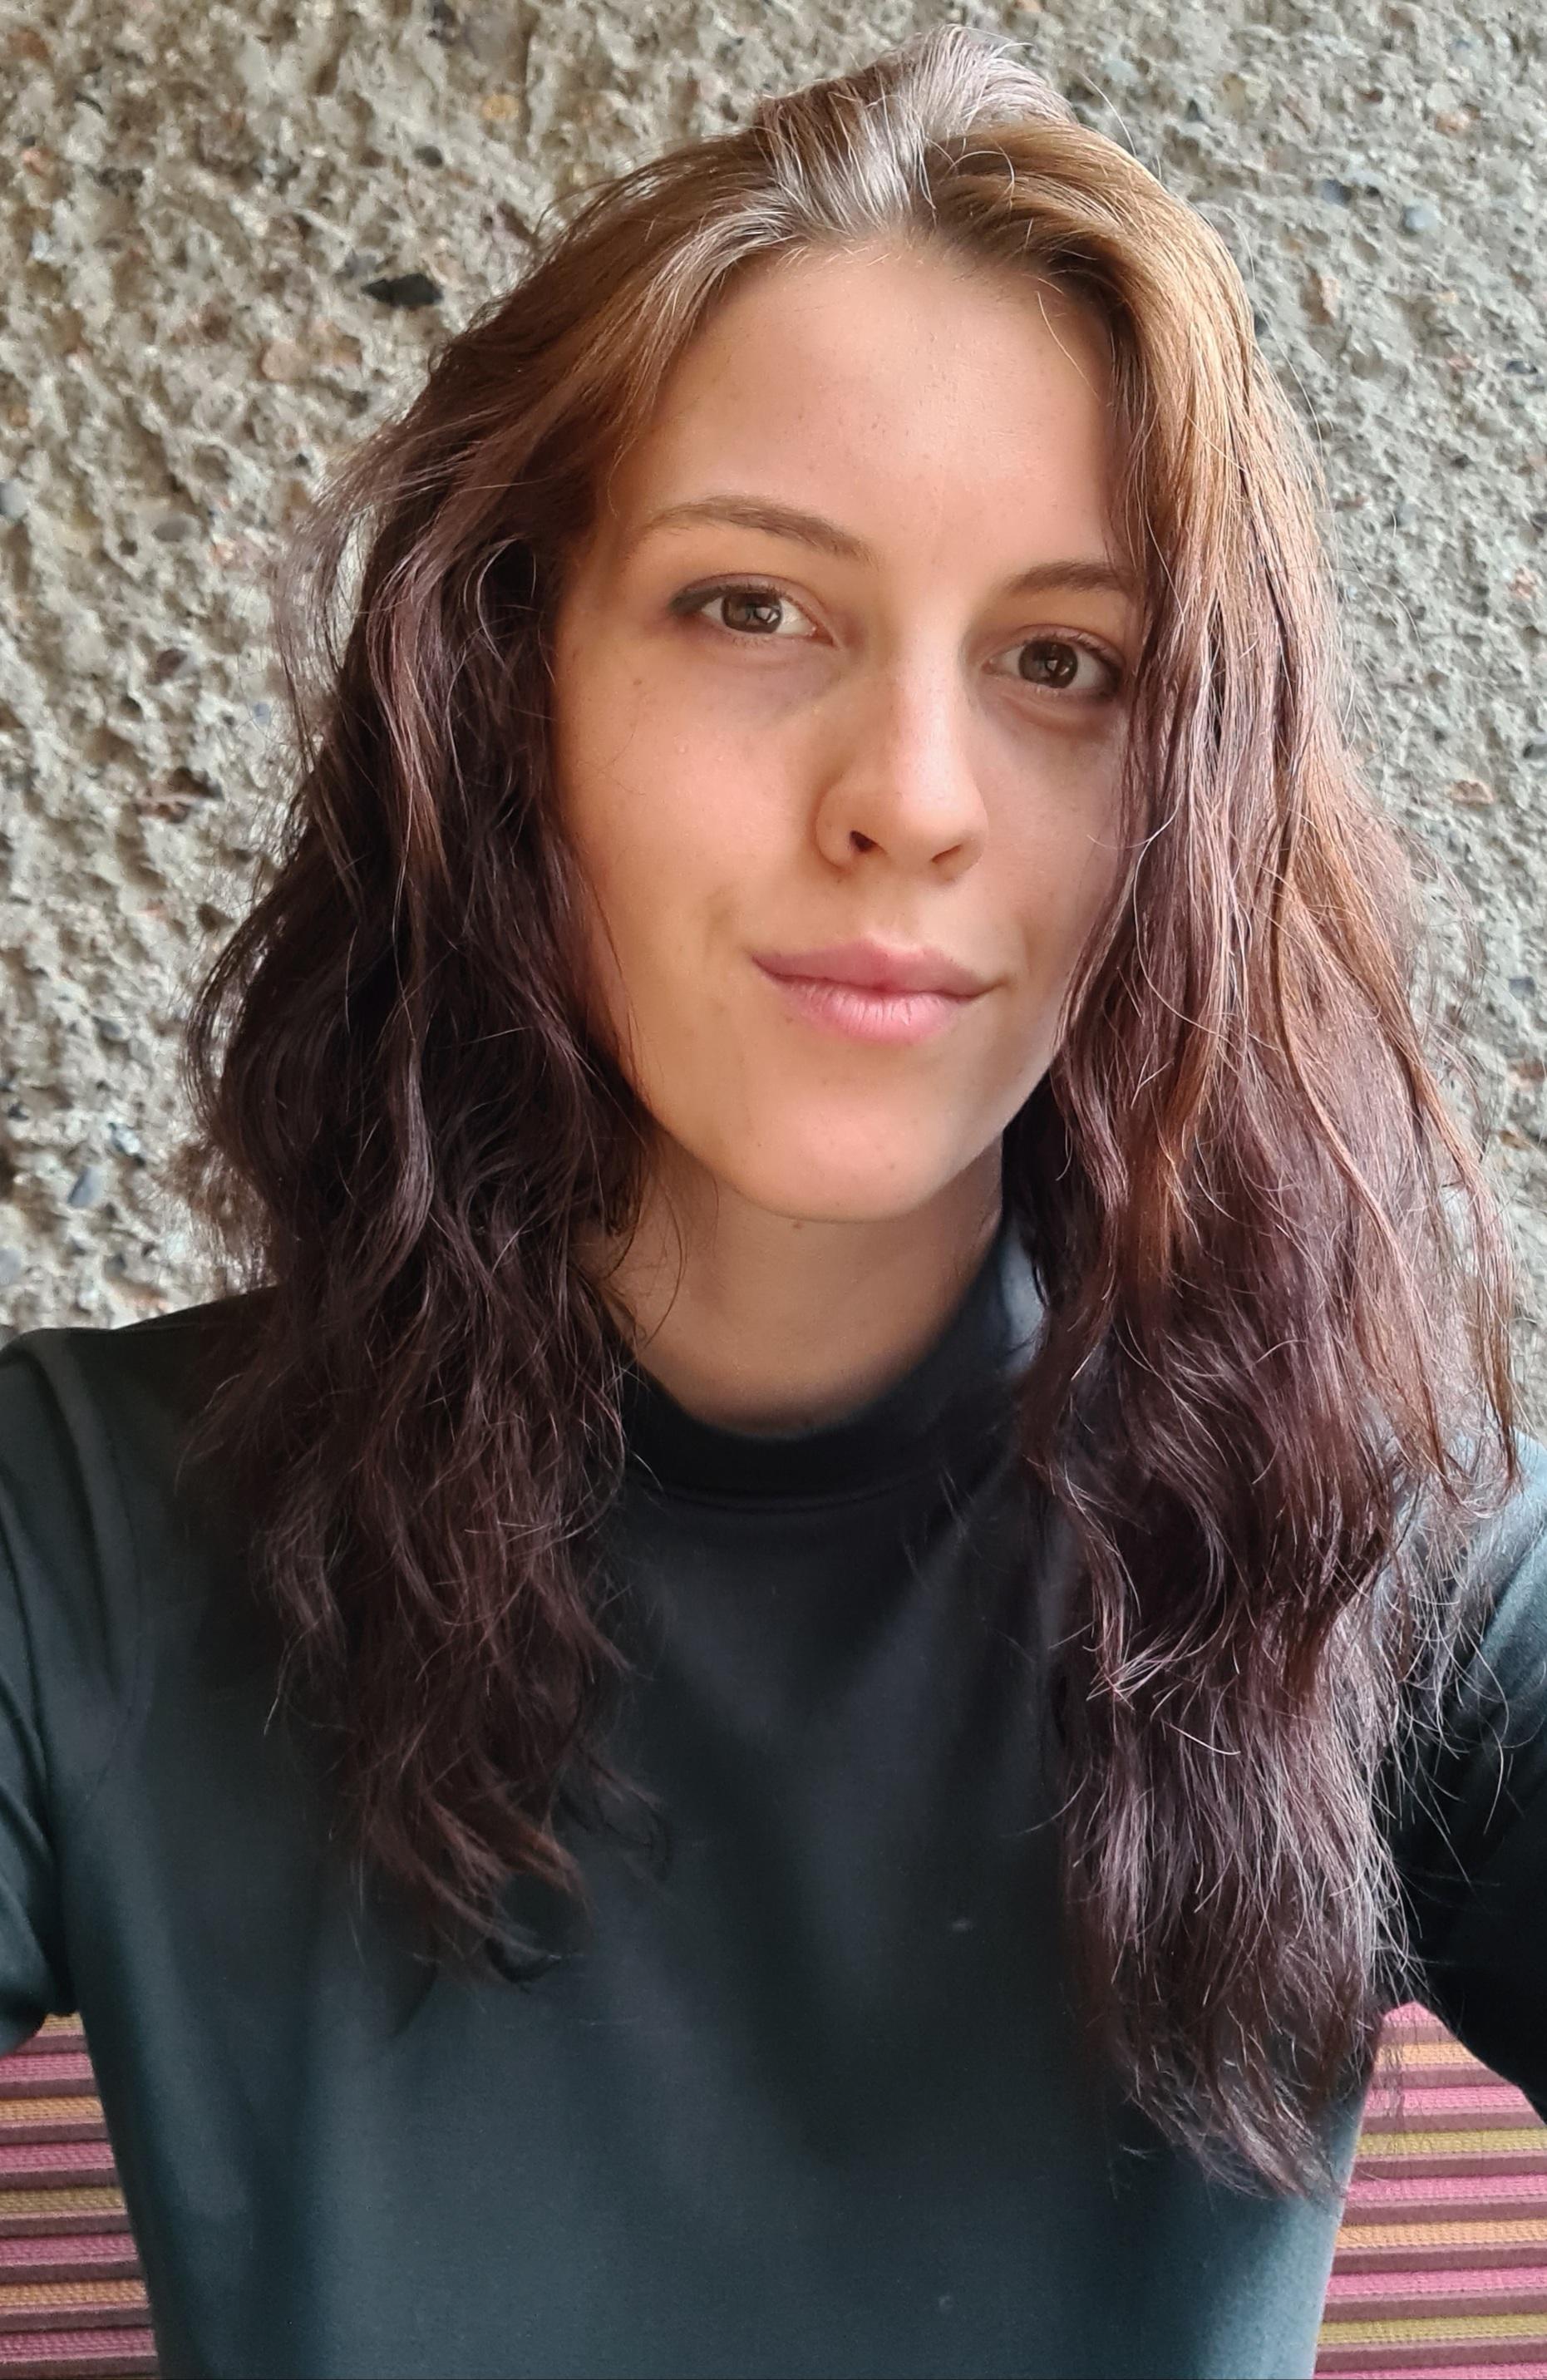 Katarina Bonnevie